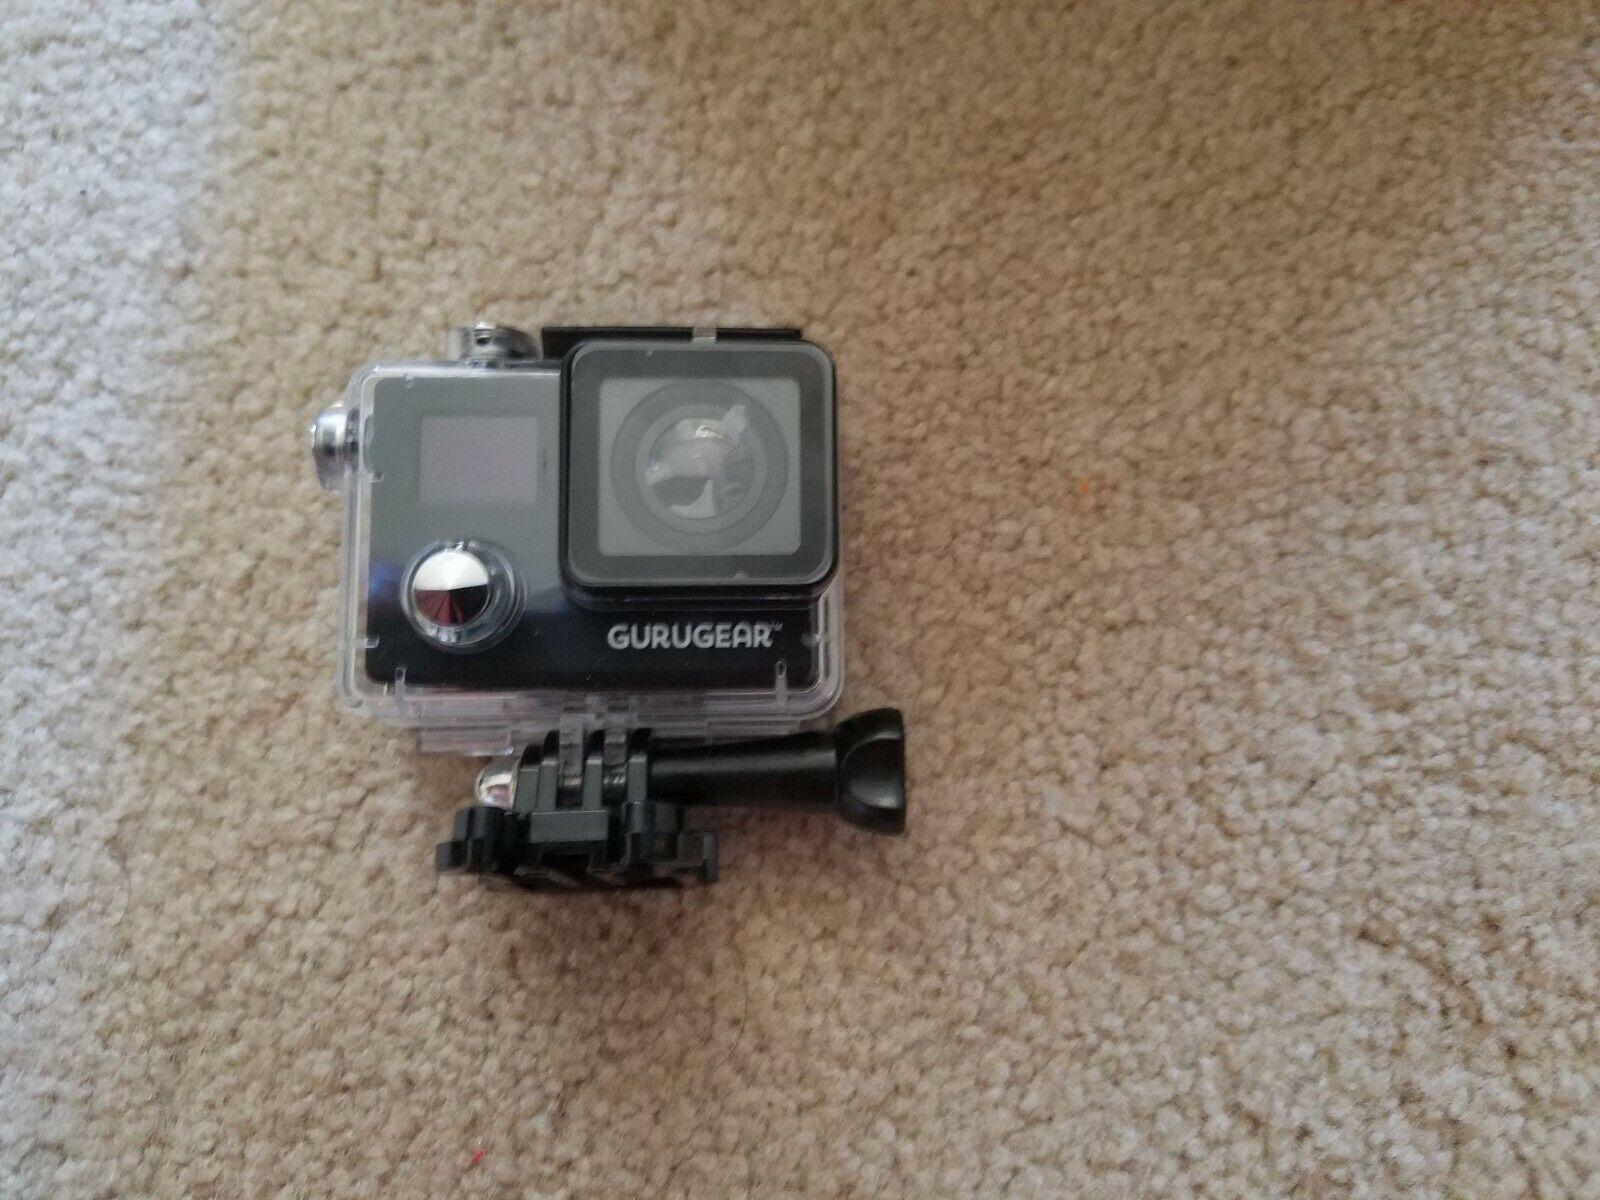 GuruGear 4K UHD Dual-Screen Waterproof Action Camera - Black action black camera gurugear uhd waterproof